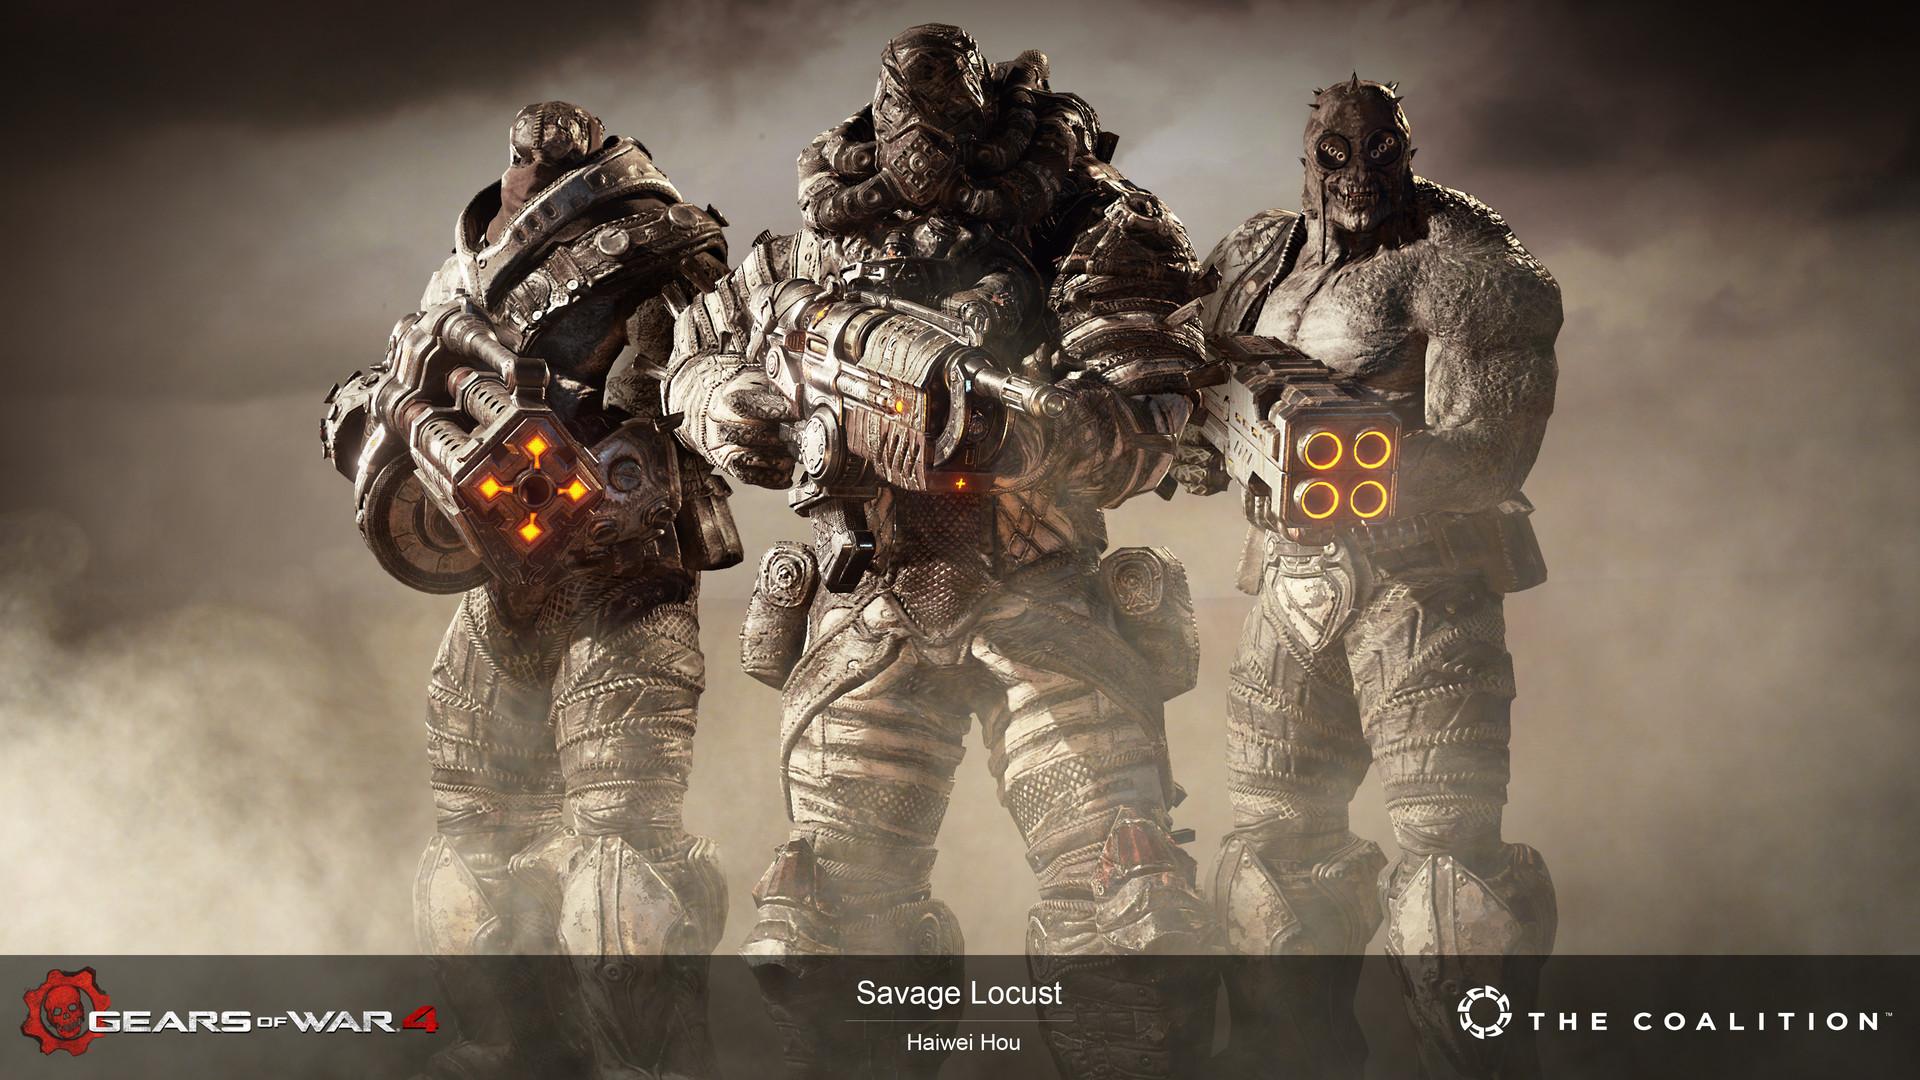 Gears Of War 4 Savage Locust - 4K render